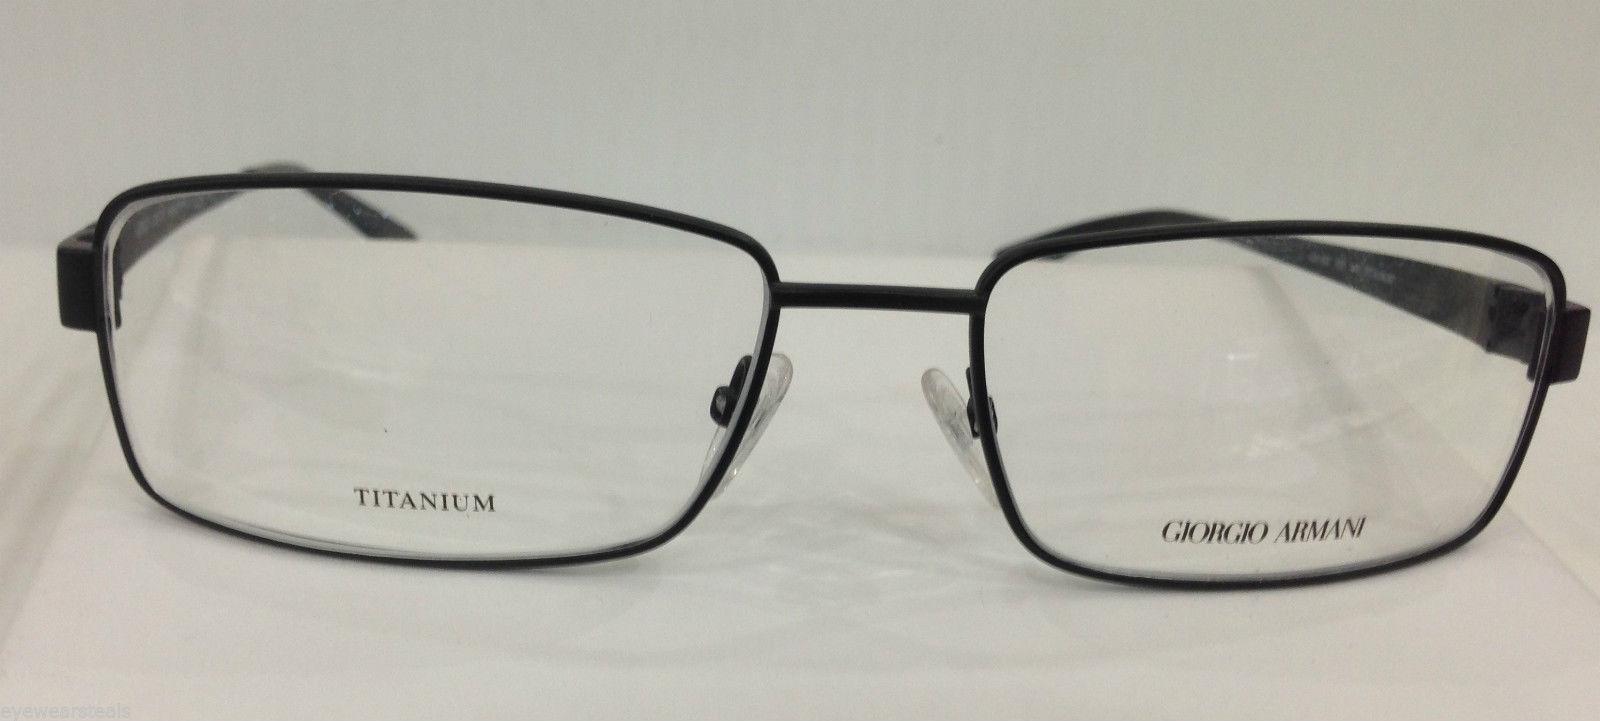 Giorgio Armani GA801 Col 003 Black Titanium Eyeglasses ...